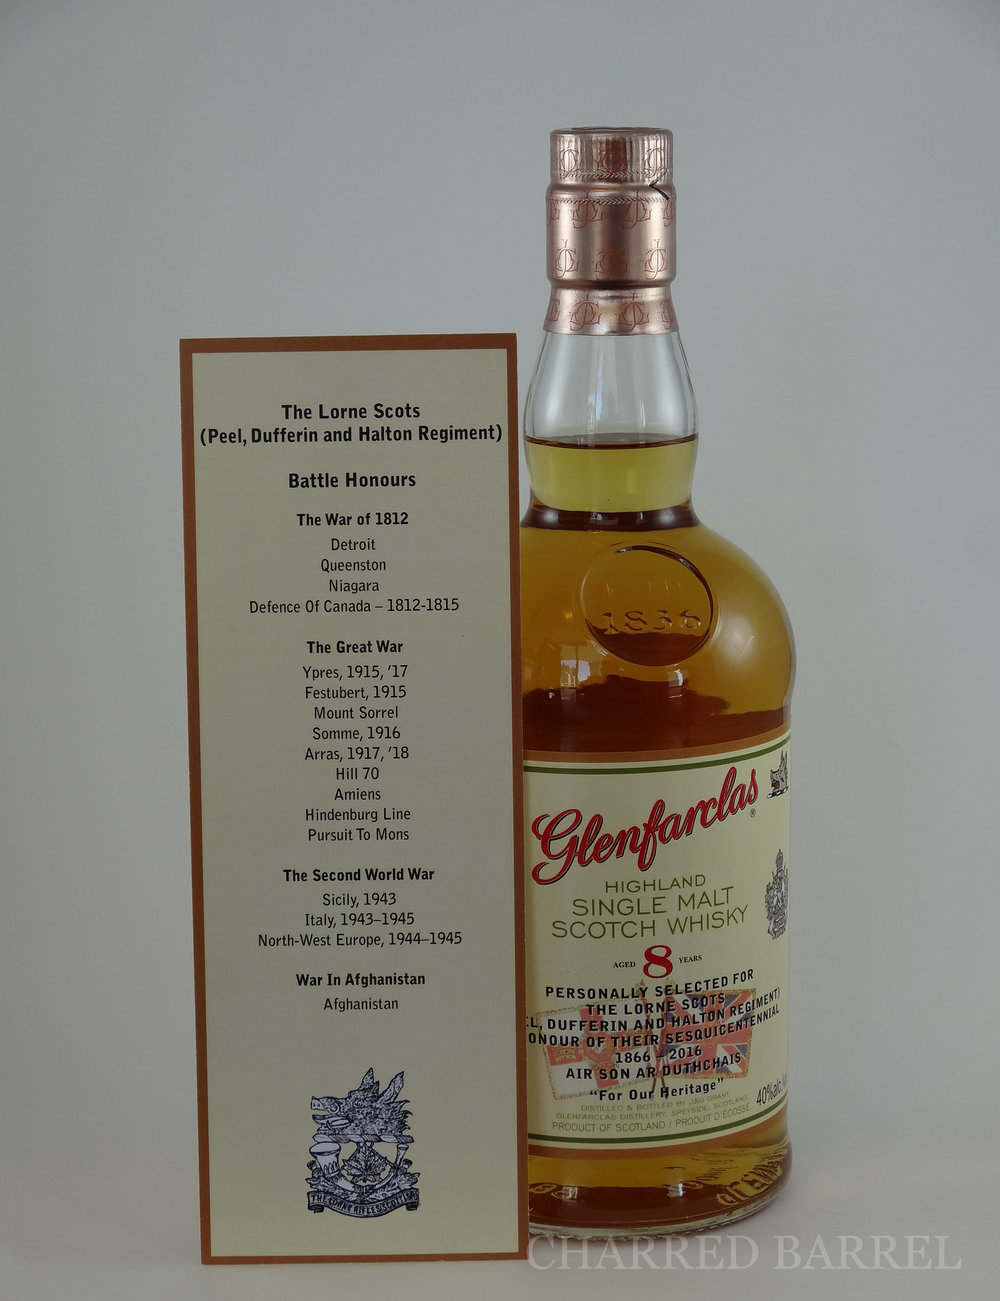 Bottle-Front-InfoCard.jpg